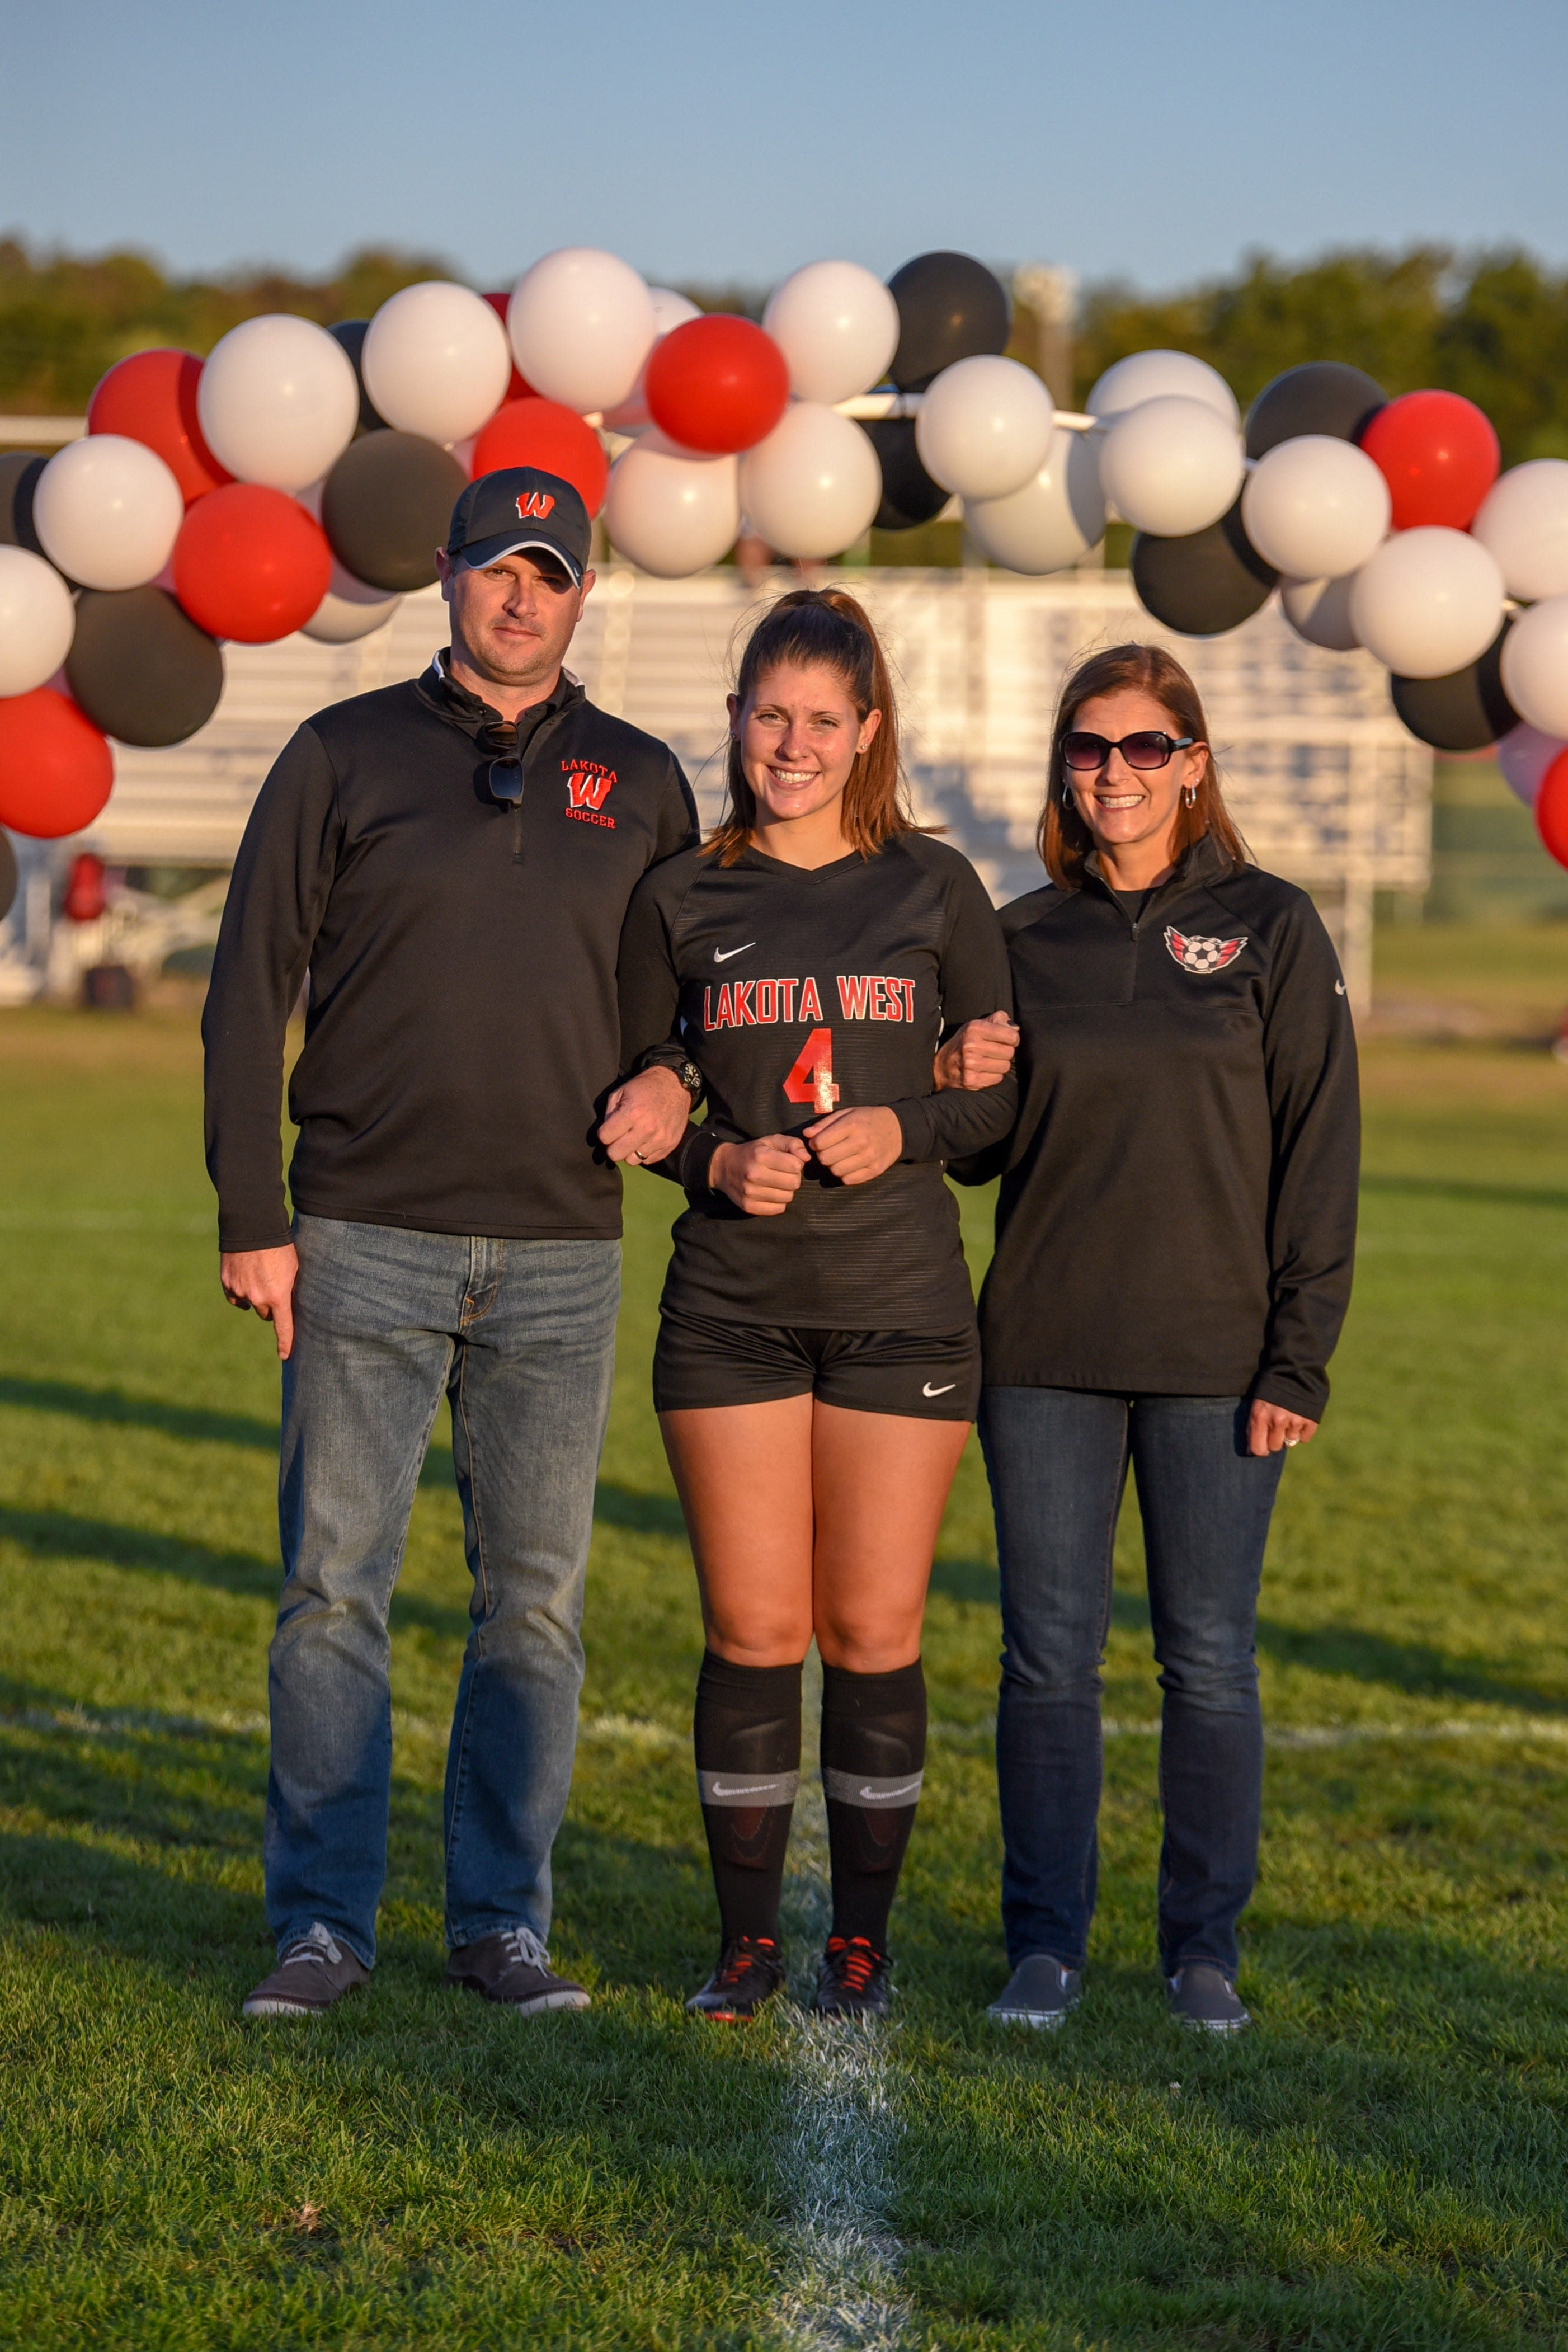 PHOTOS: Families share fall sports Senior Night photos